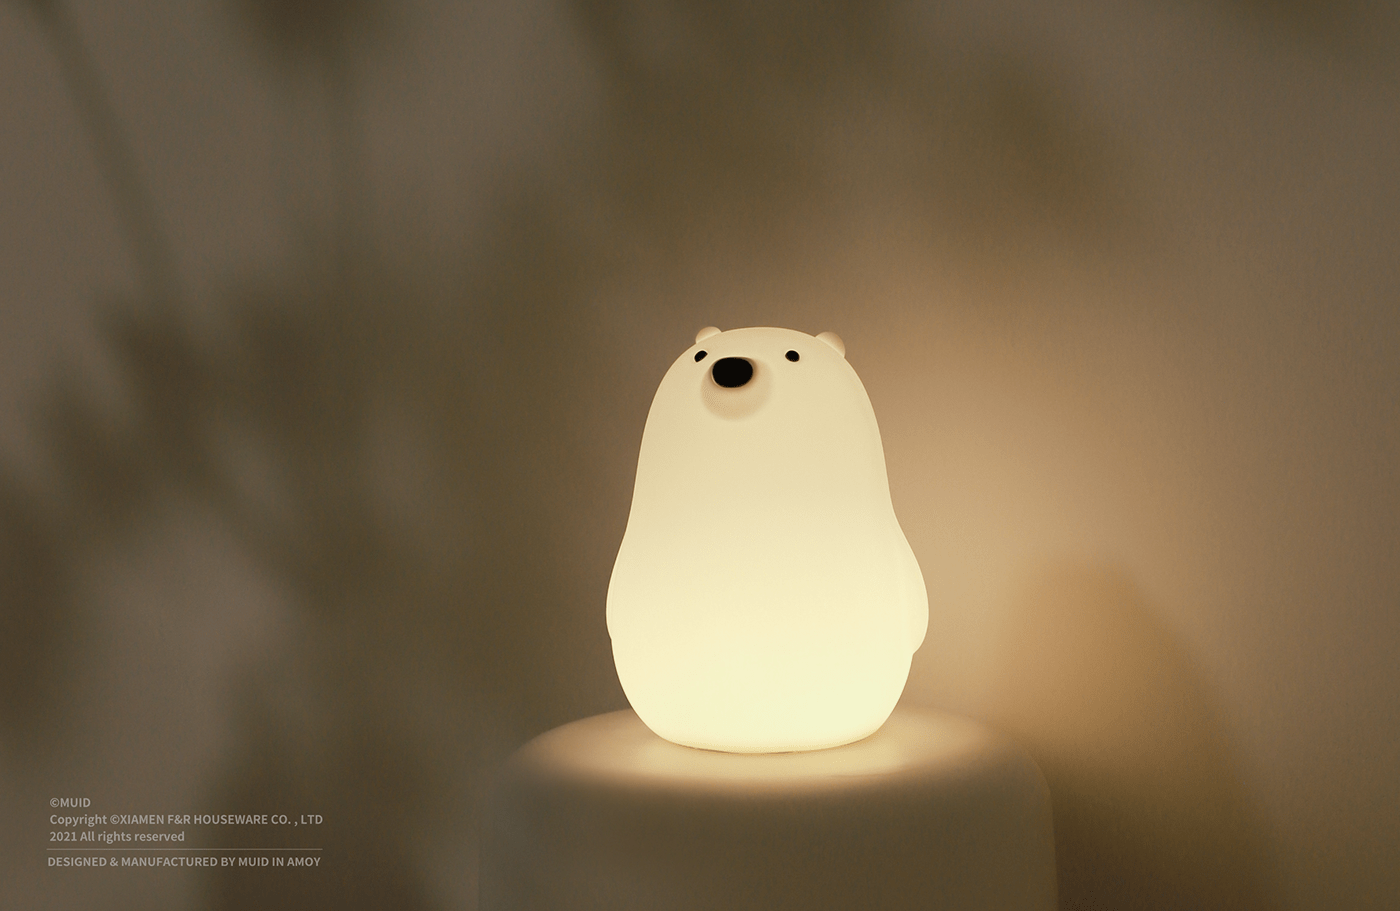 light Muid night lamp product design  产品设计 工业设计